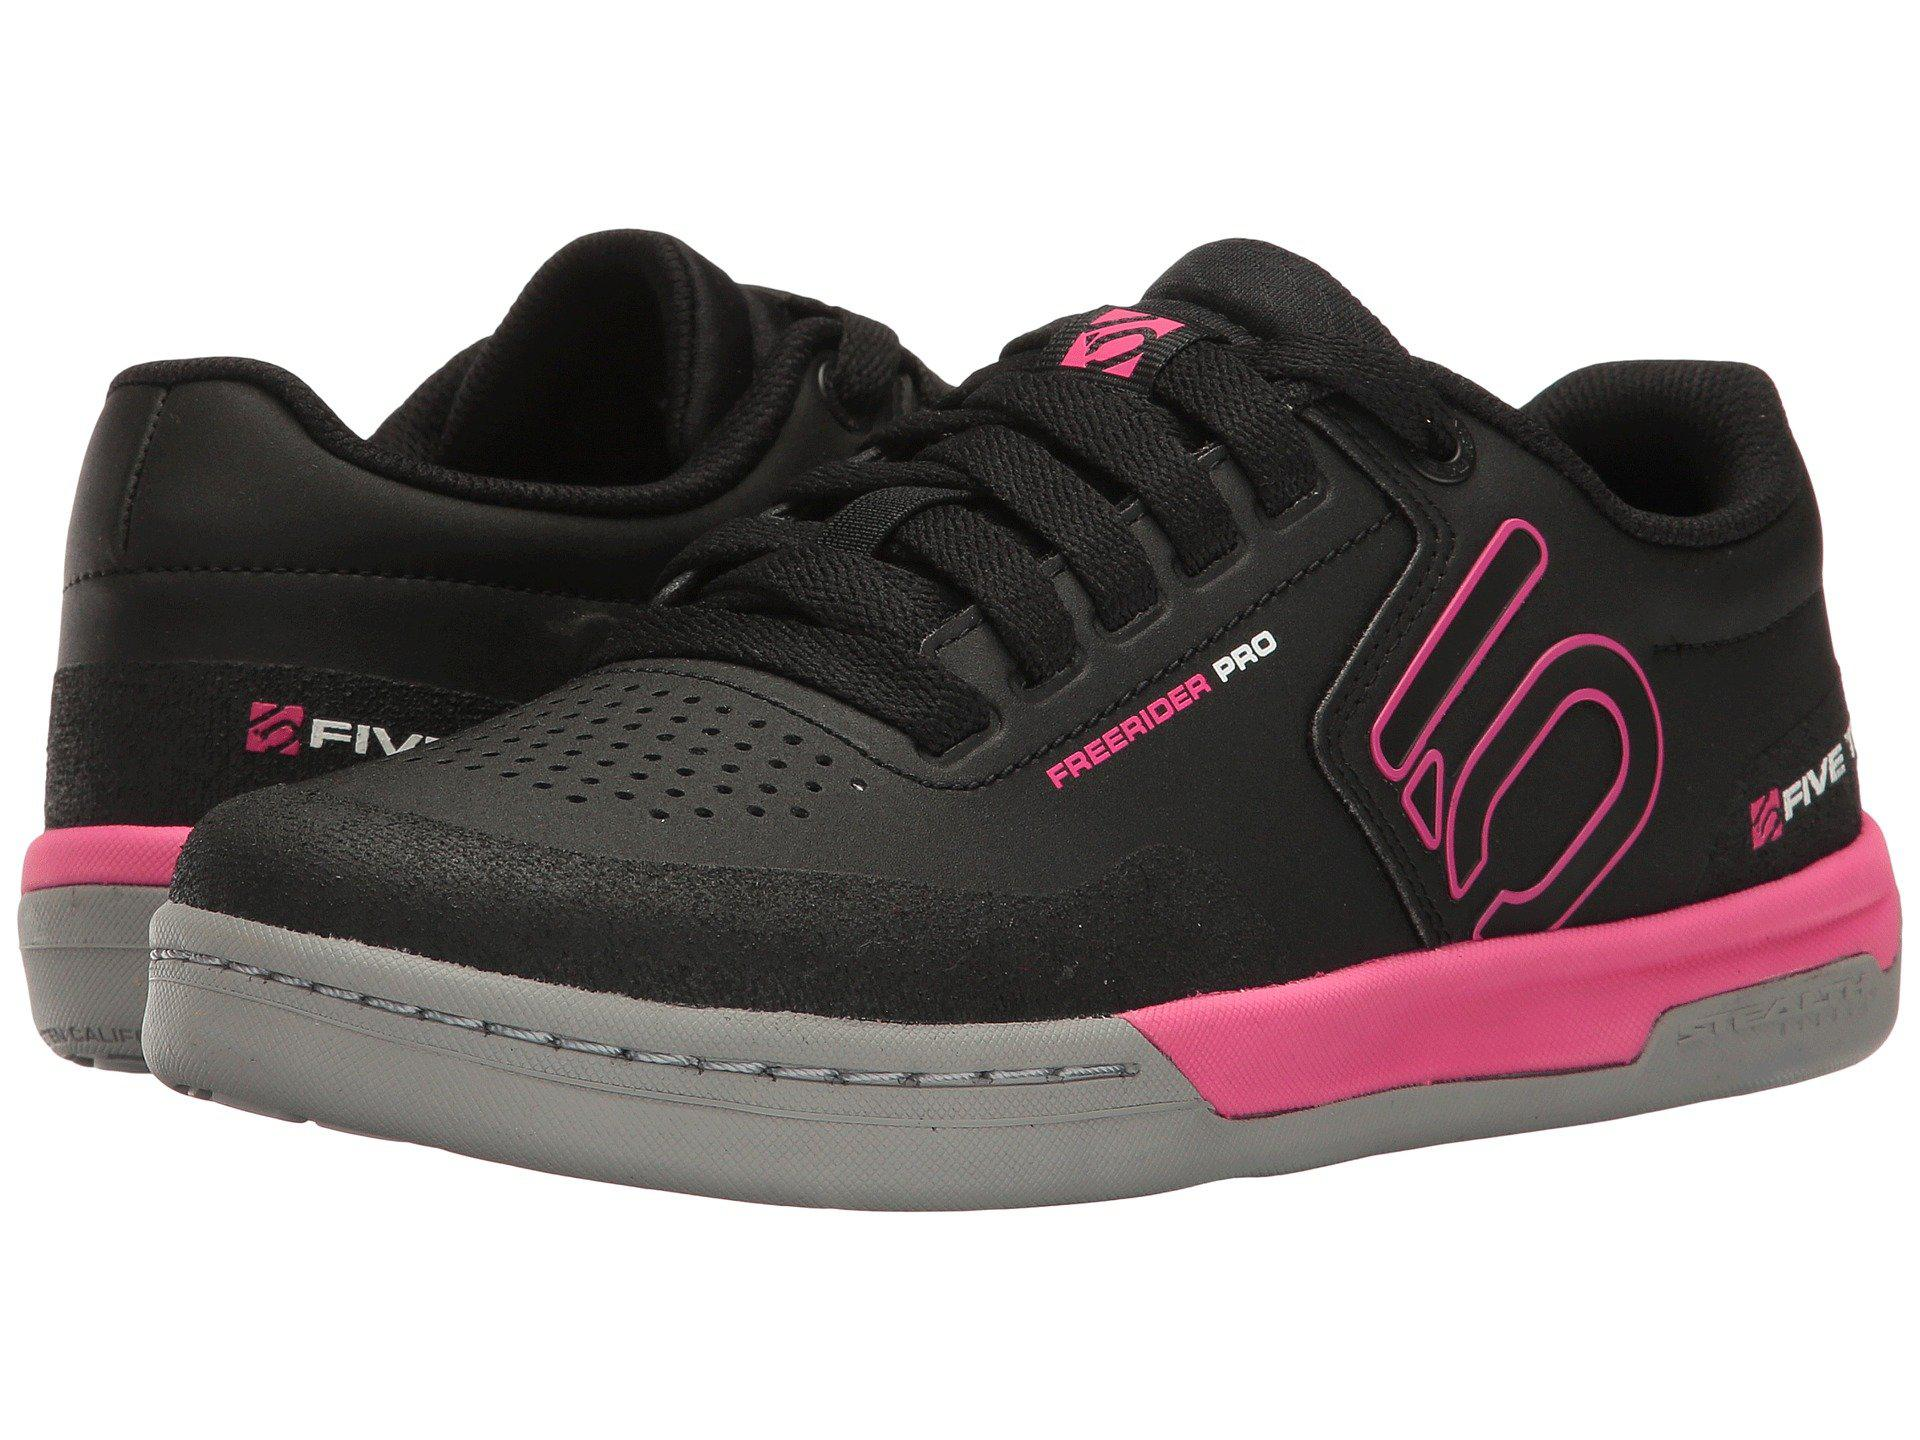 Lyst - Five Ten Freerider Pro (black pink) Women s Shoes f7f9c36e8d